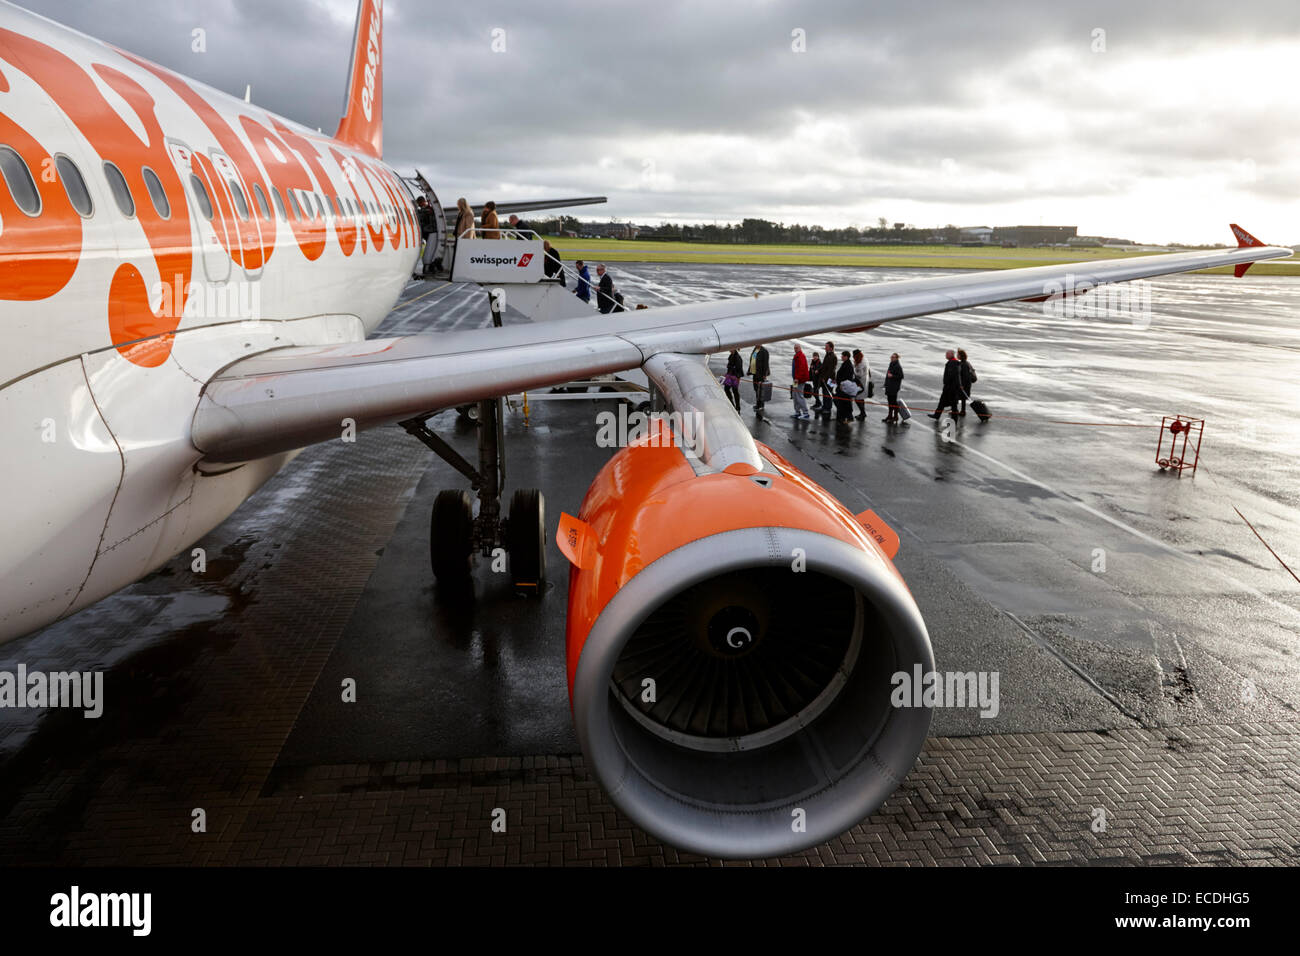 passengers boarding easyjet airbus aircraft at belfast international airport - Stock Image